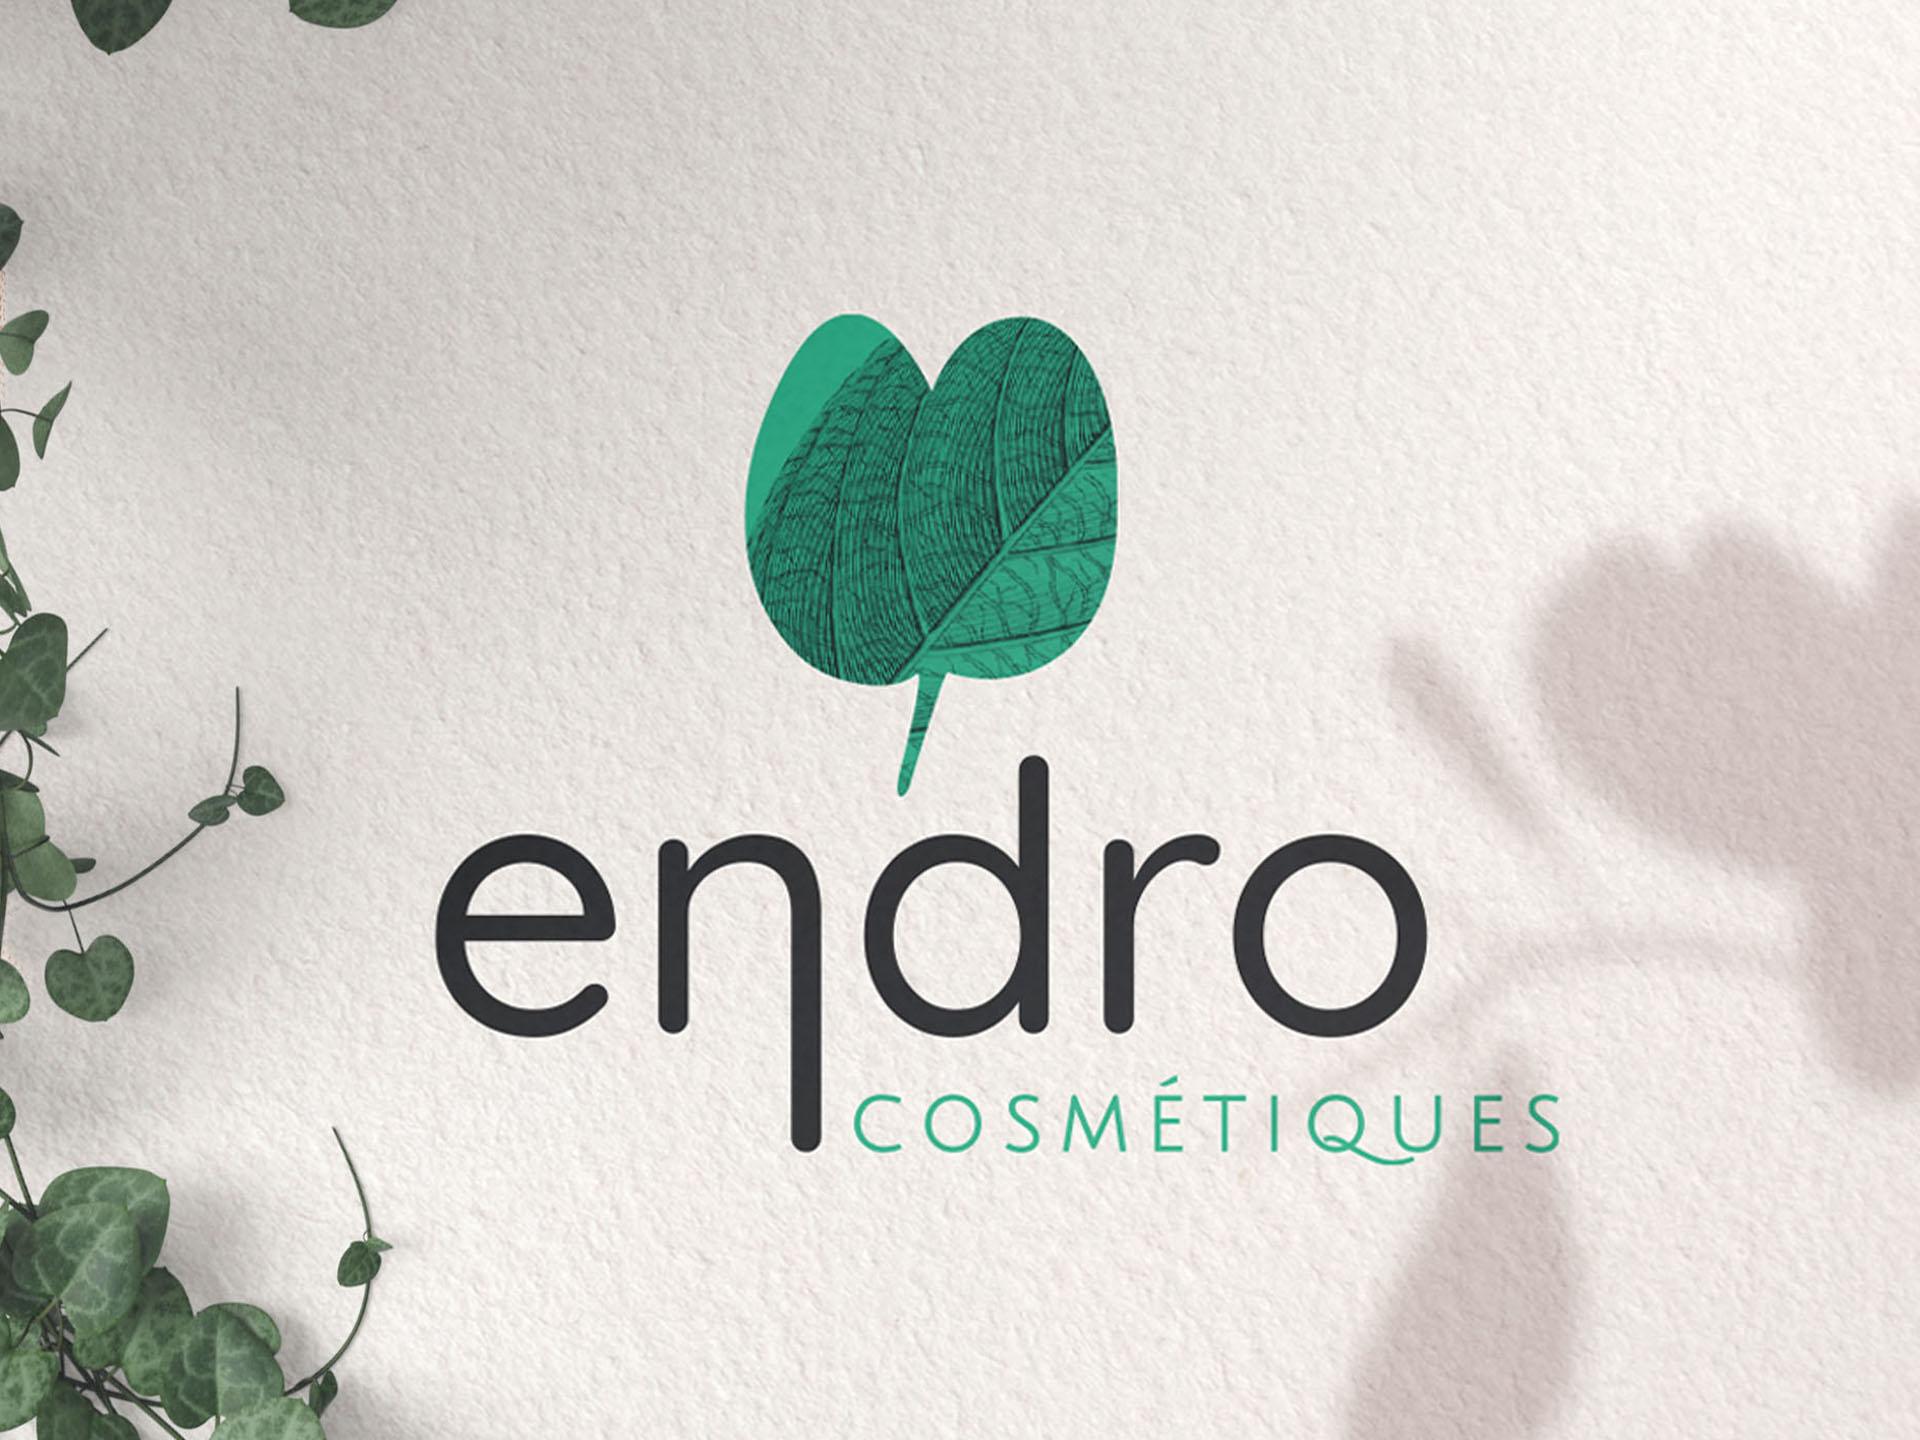 endro-cosmetiques-etiquettes-identite-visuelle-coqueliko-lannion